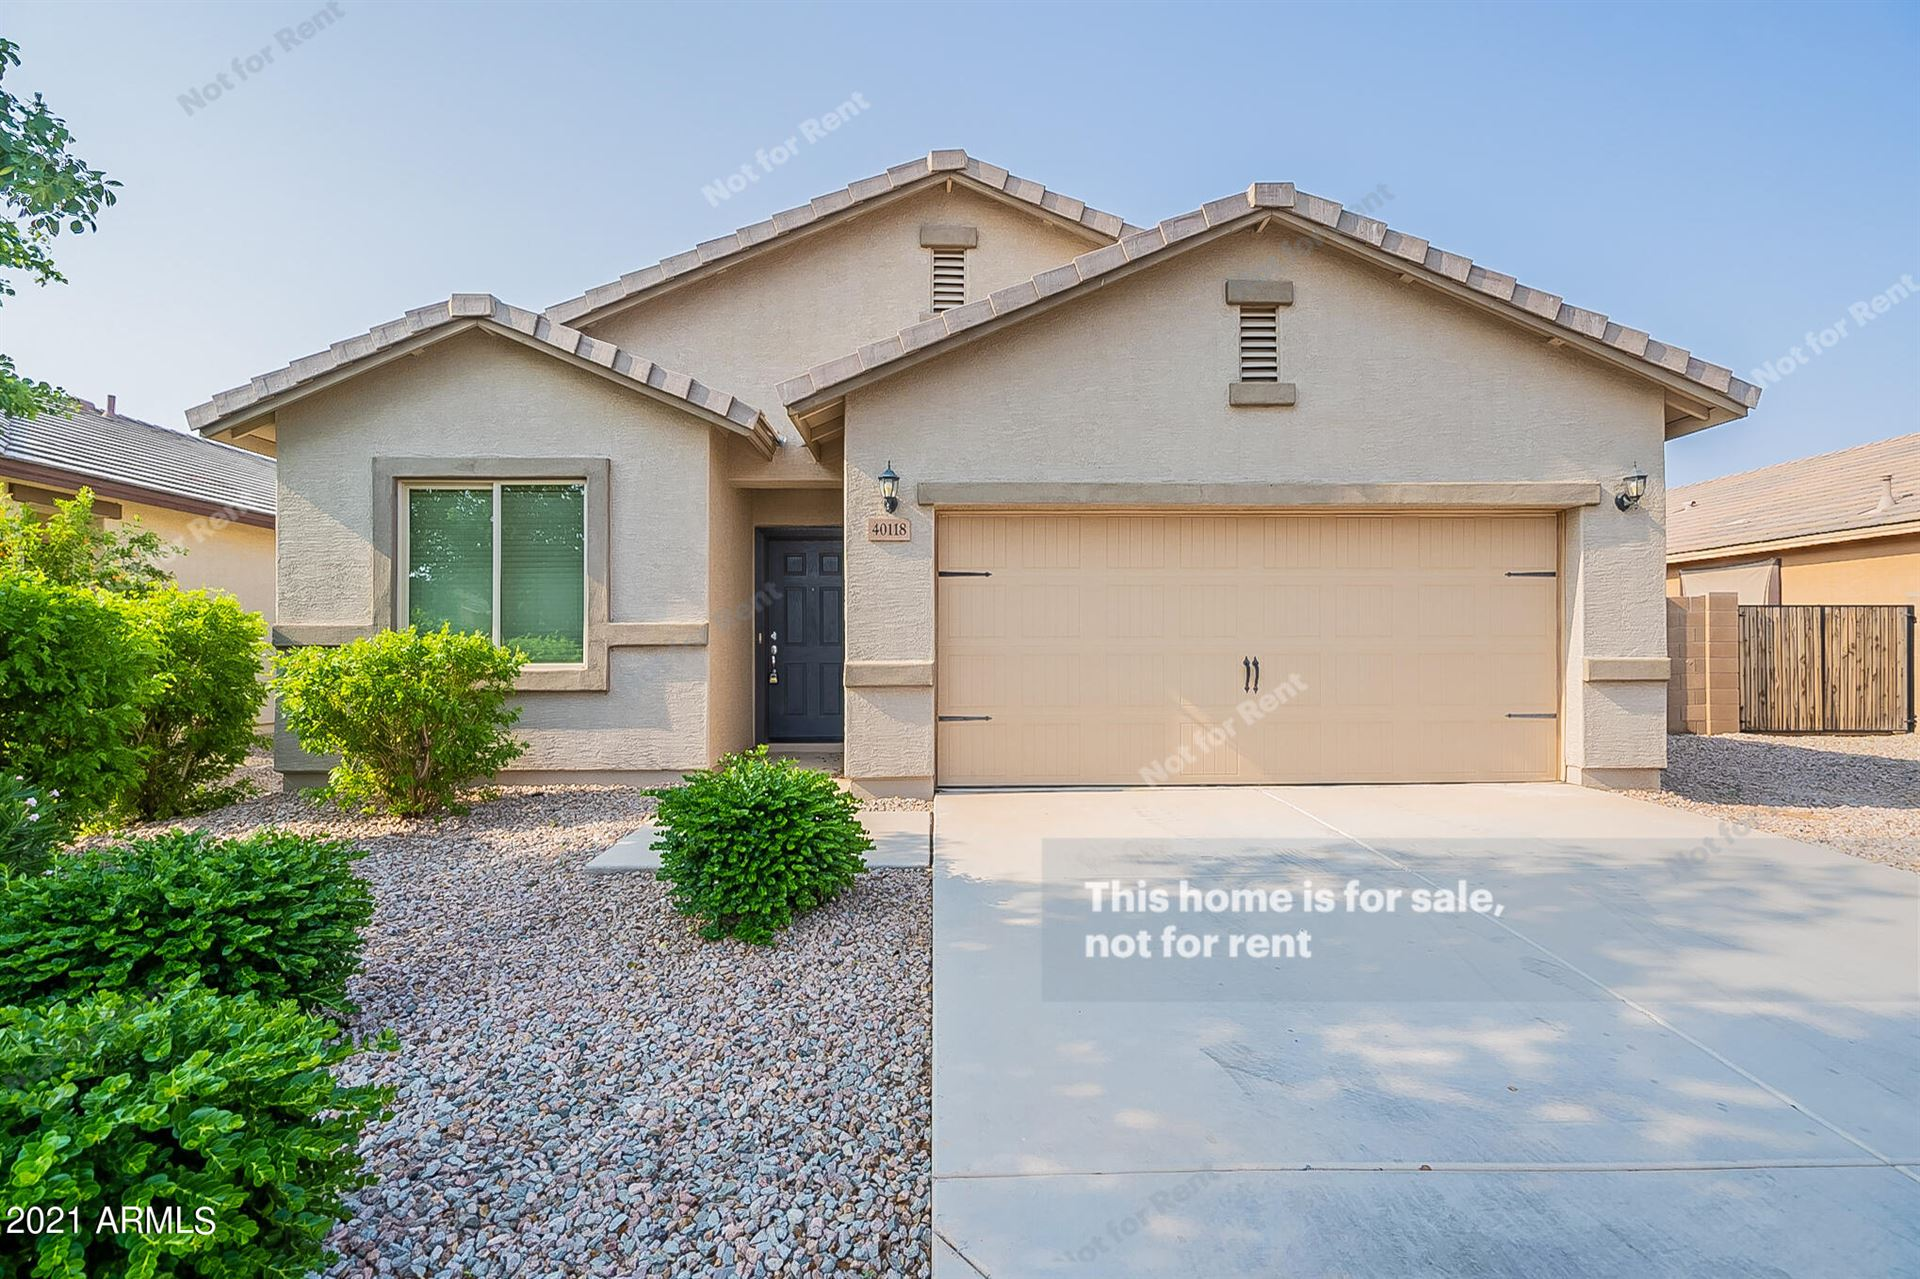 Photo for 40118 W Walker Way, Maricopa, AZ 85138 (MLS # 6290513)